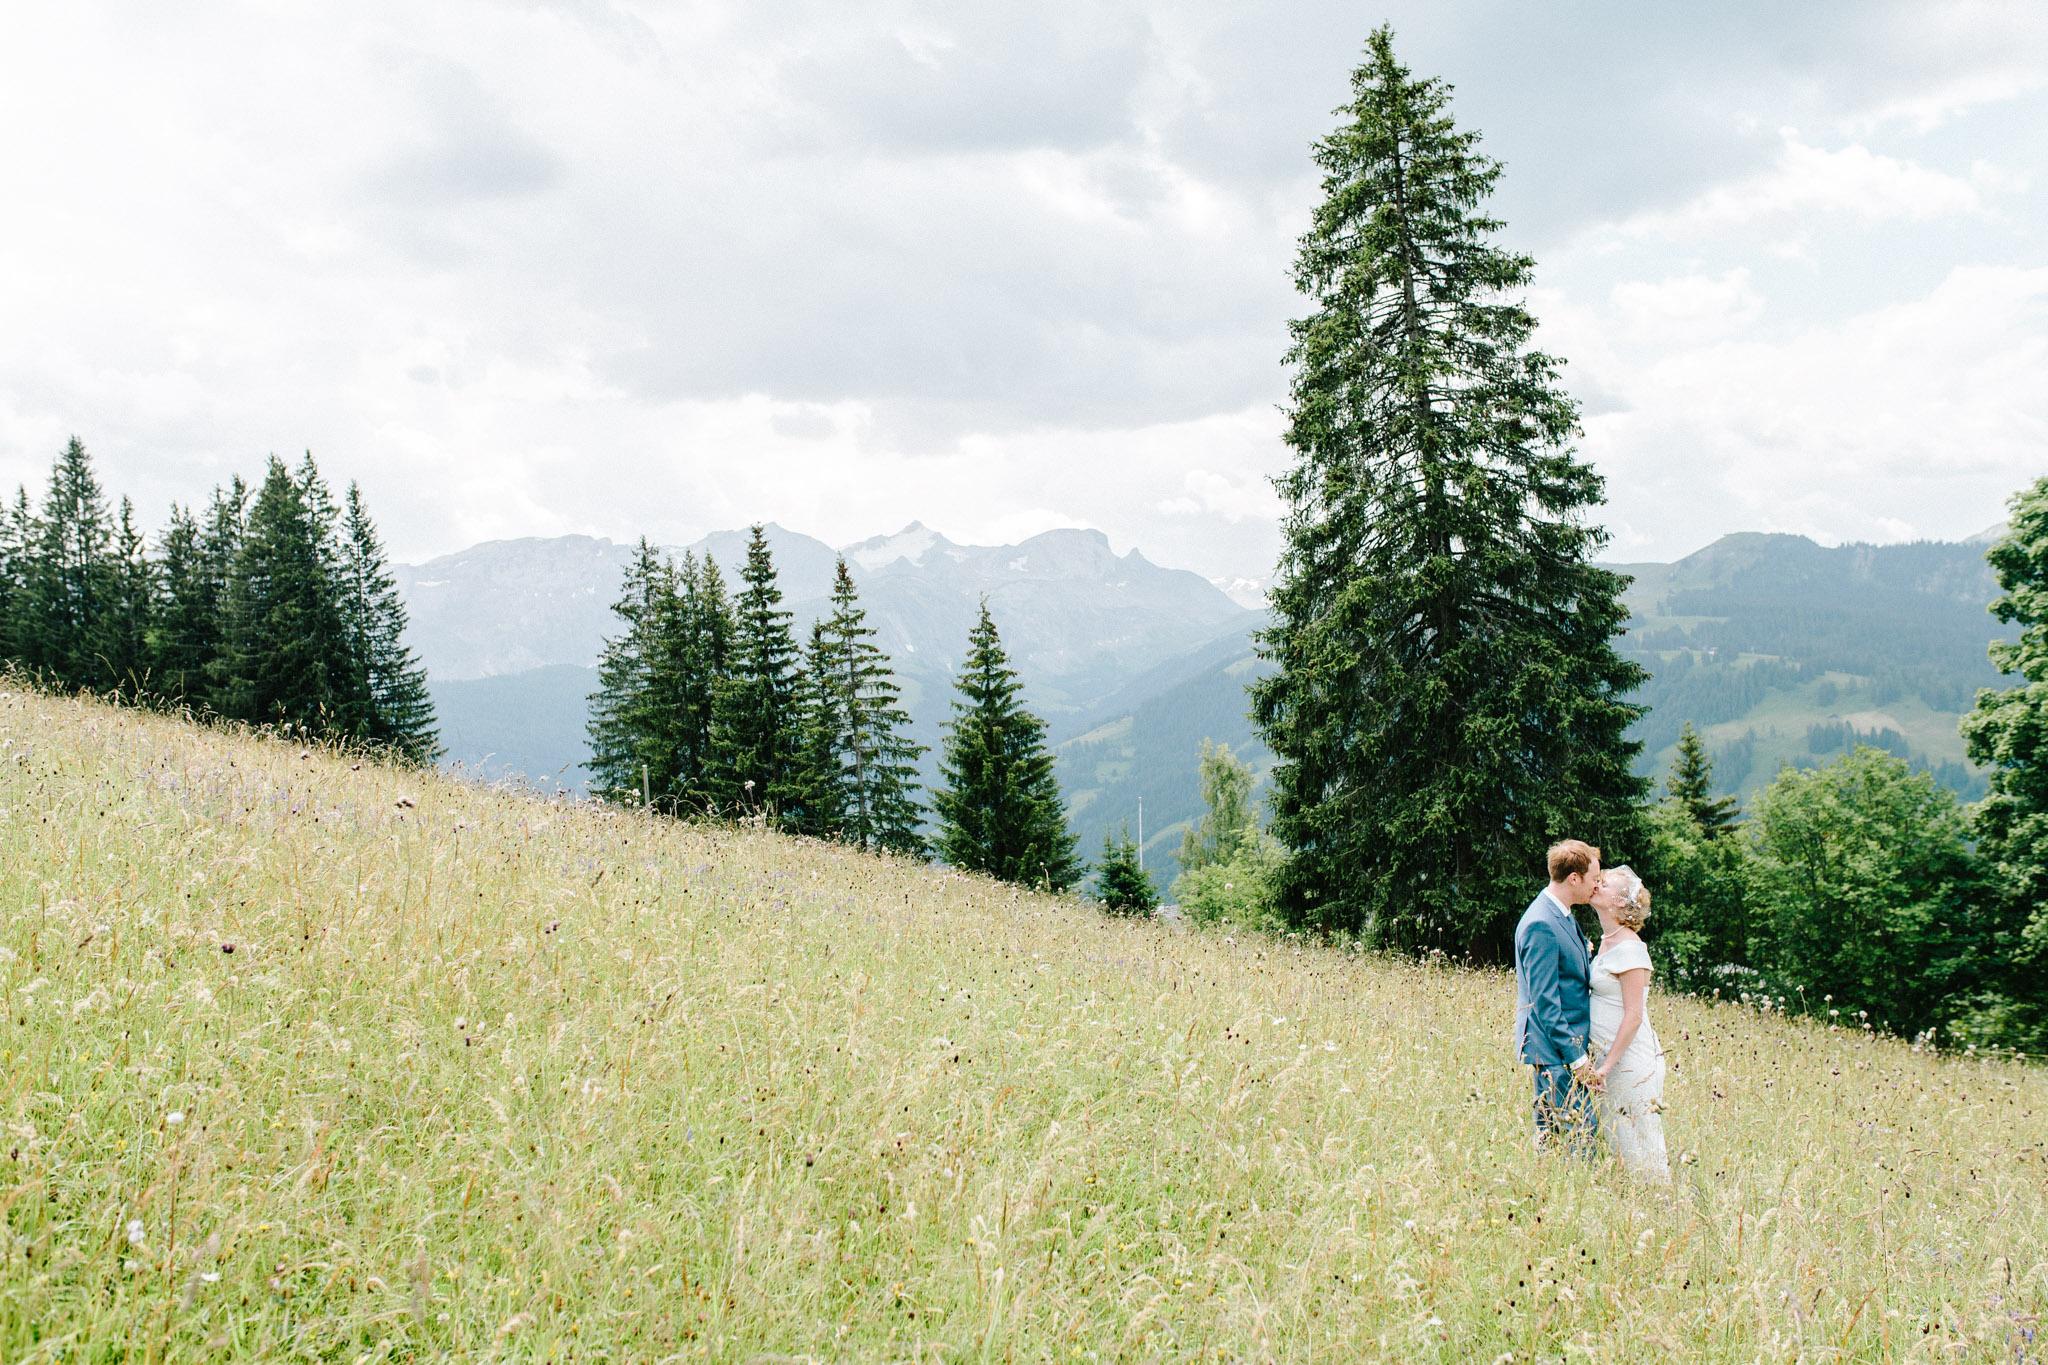 Lenl-Simmental-Buehlerhof-Pia-Anna-Christian-Wedding-Photography-EK-53.jpg